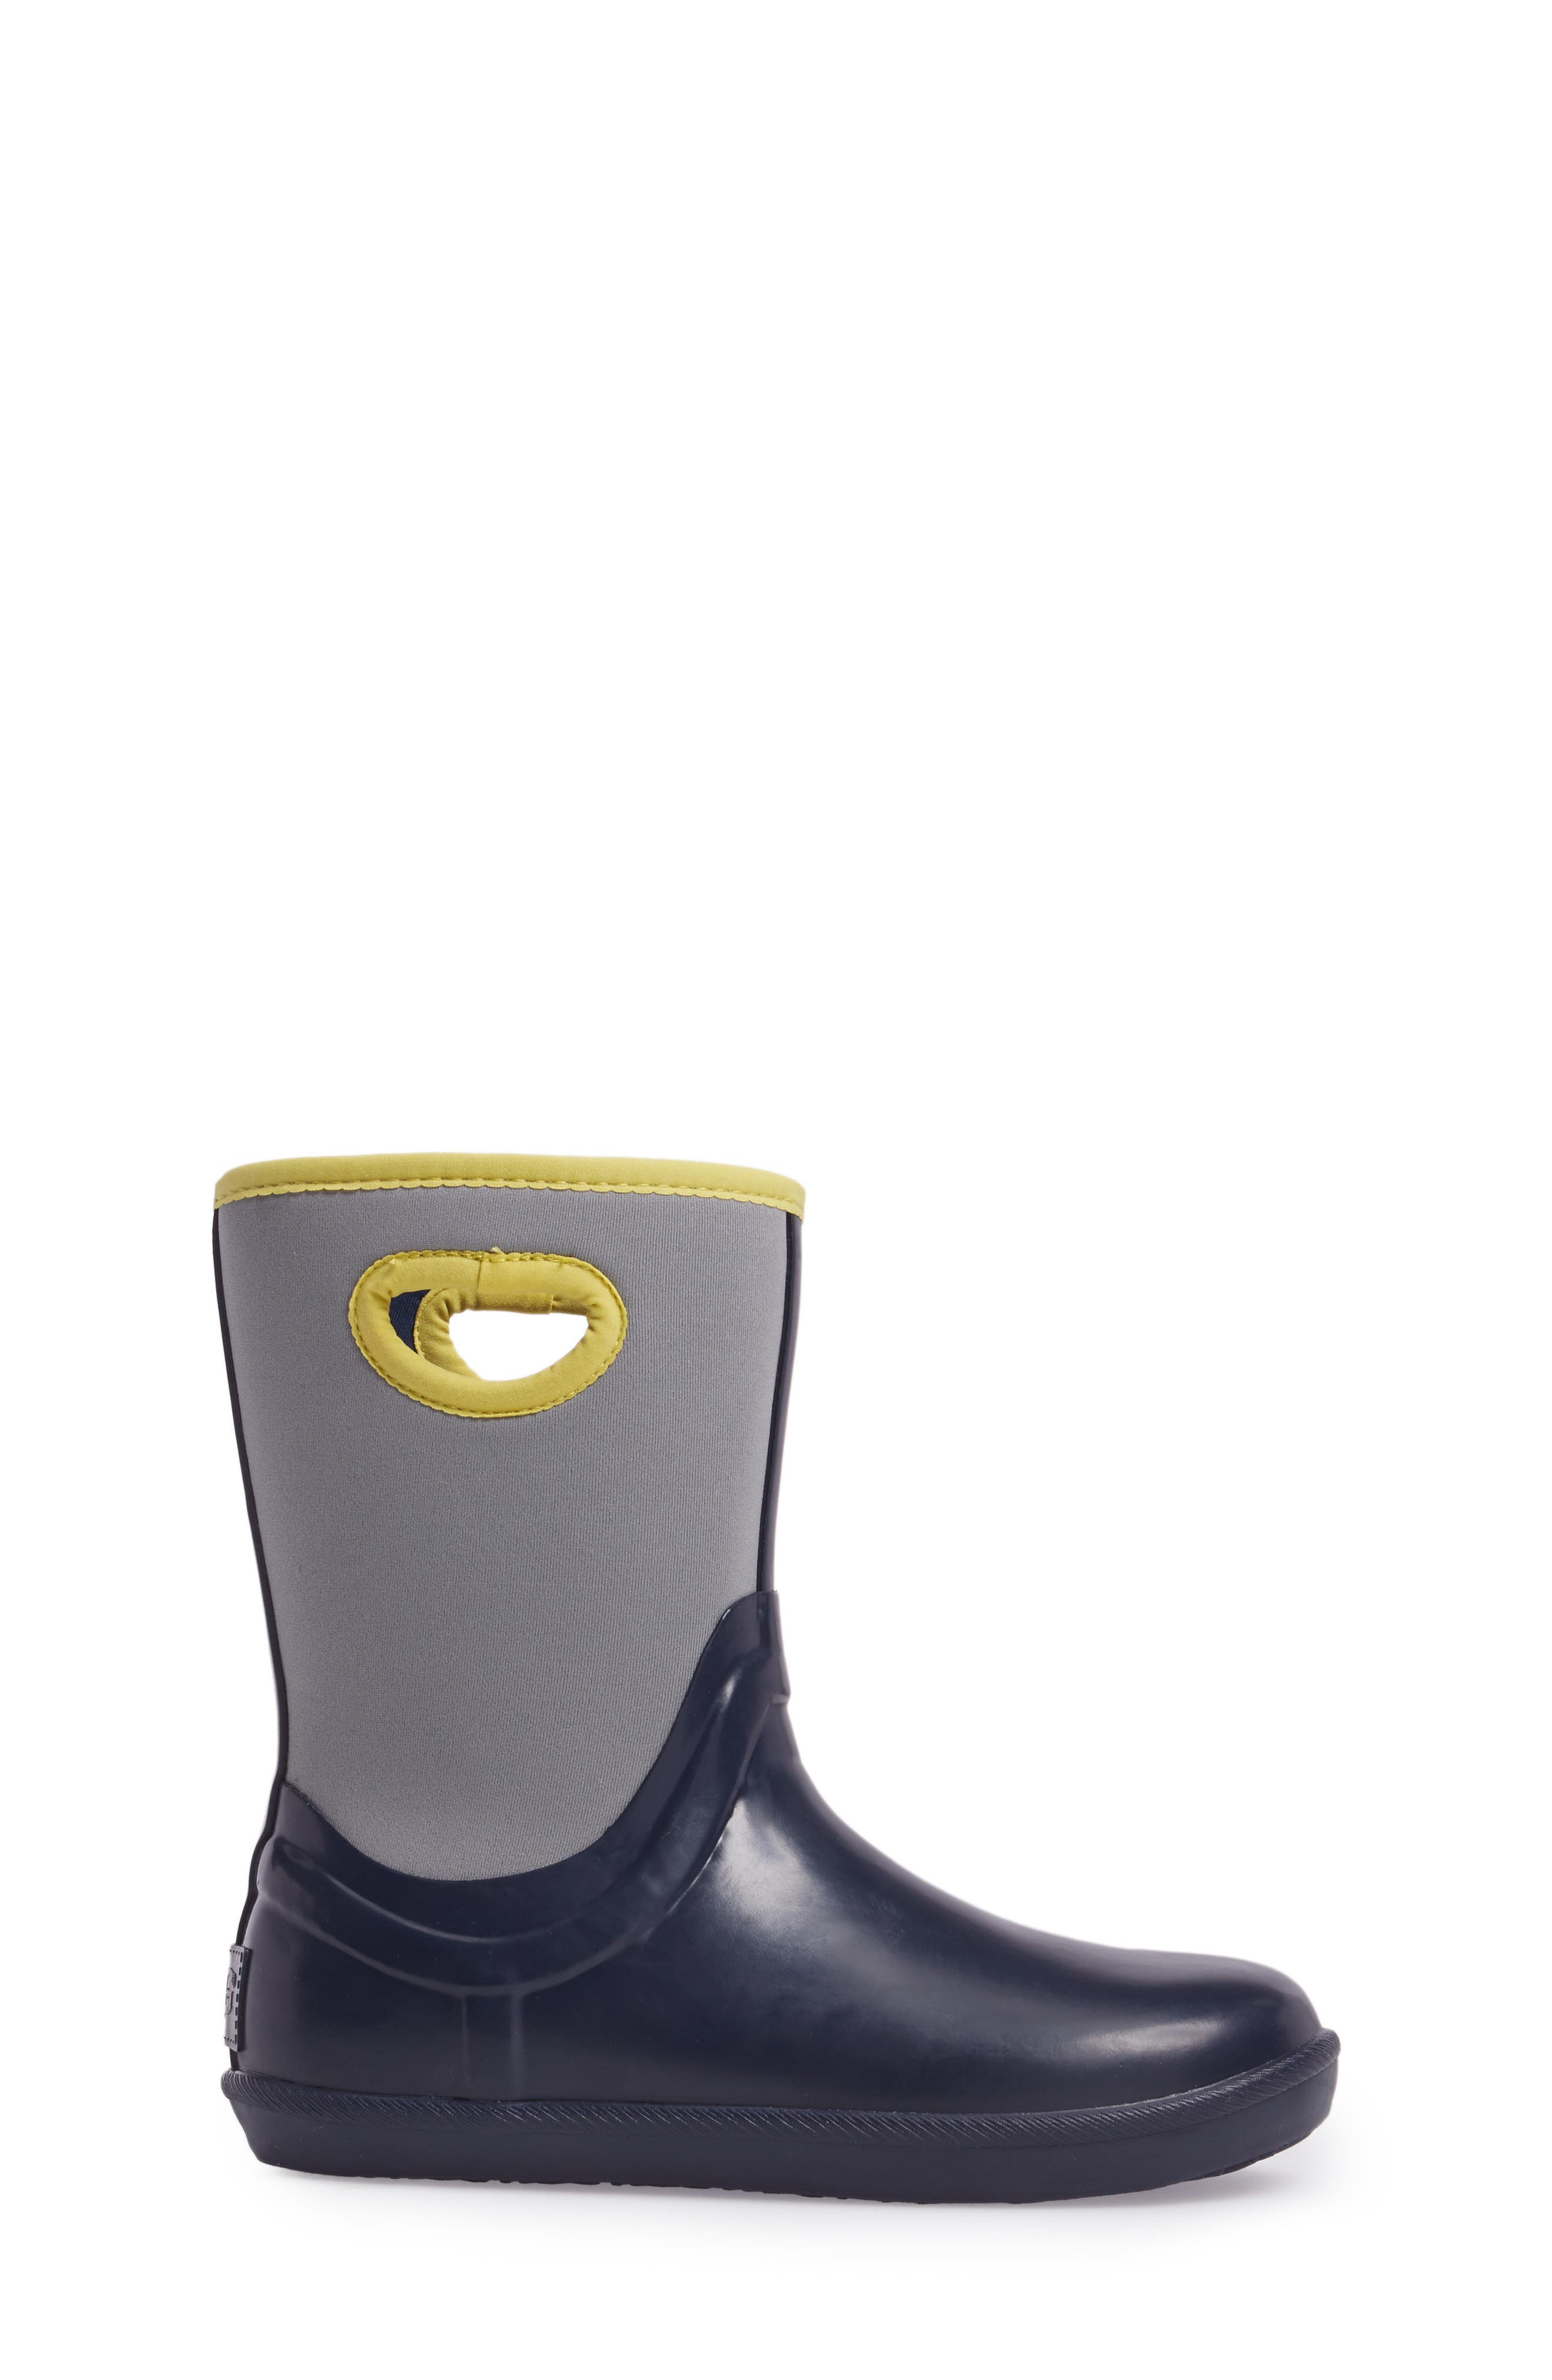 Kex Waterproof Boot,                             Alternate thumbnail 8, color,